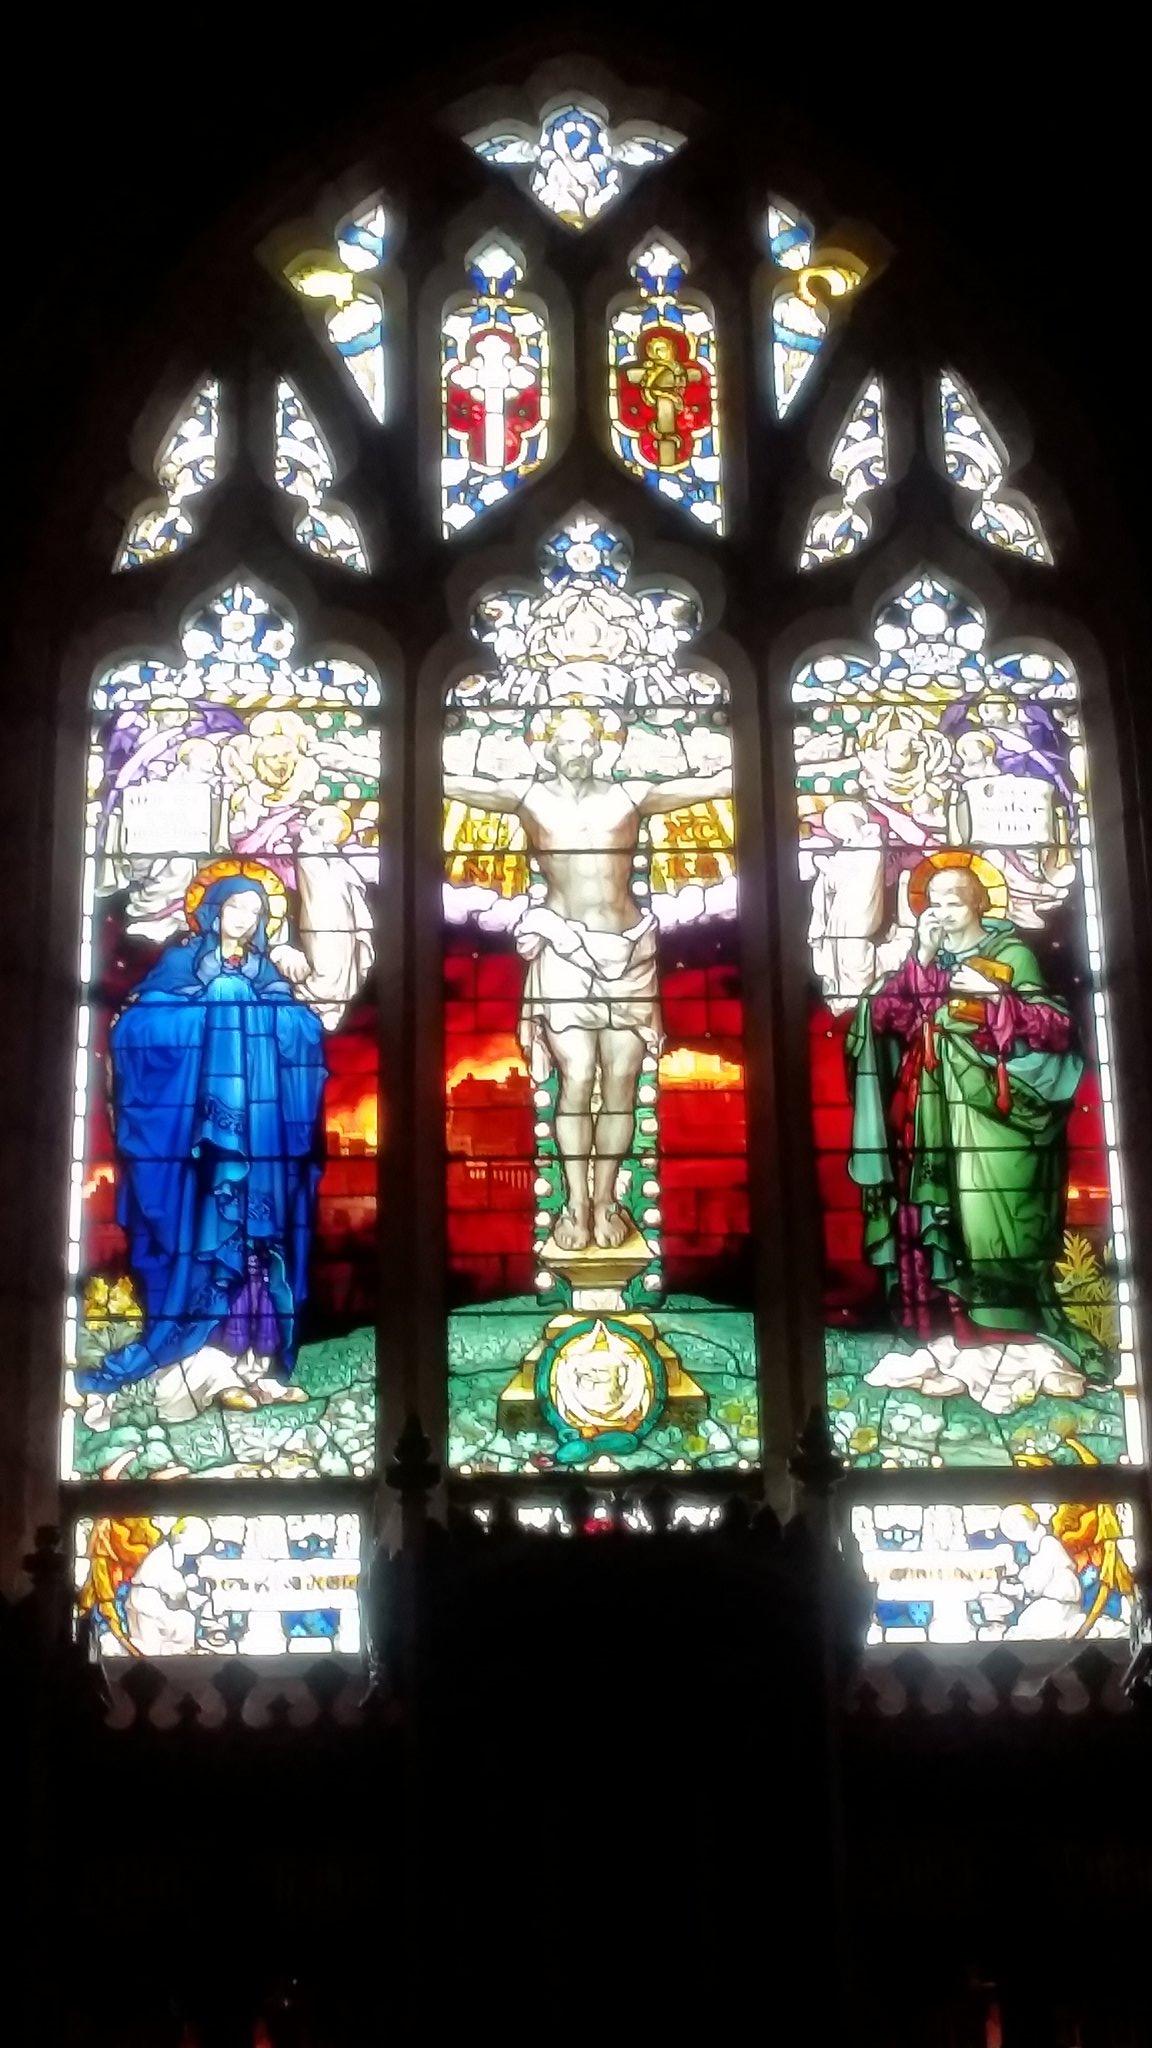 Fantastic Powhiri at King's College Chapel #Slanza17 Amazing windows too! https://t.co/VS9X7uu1p9